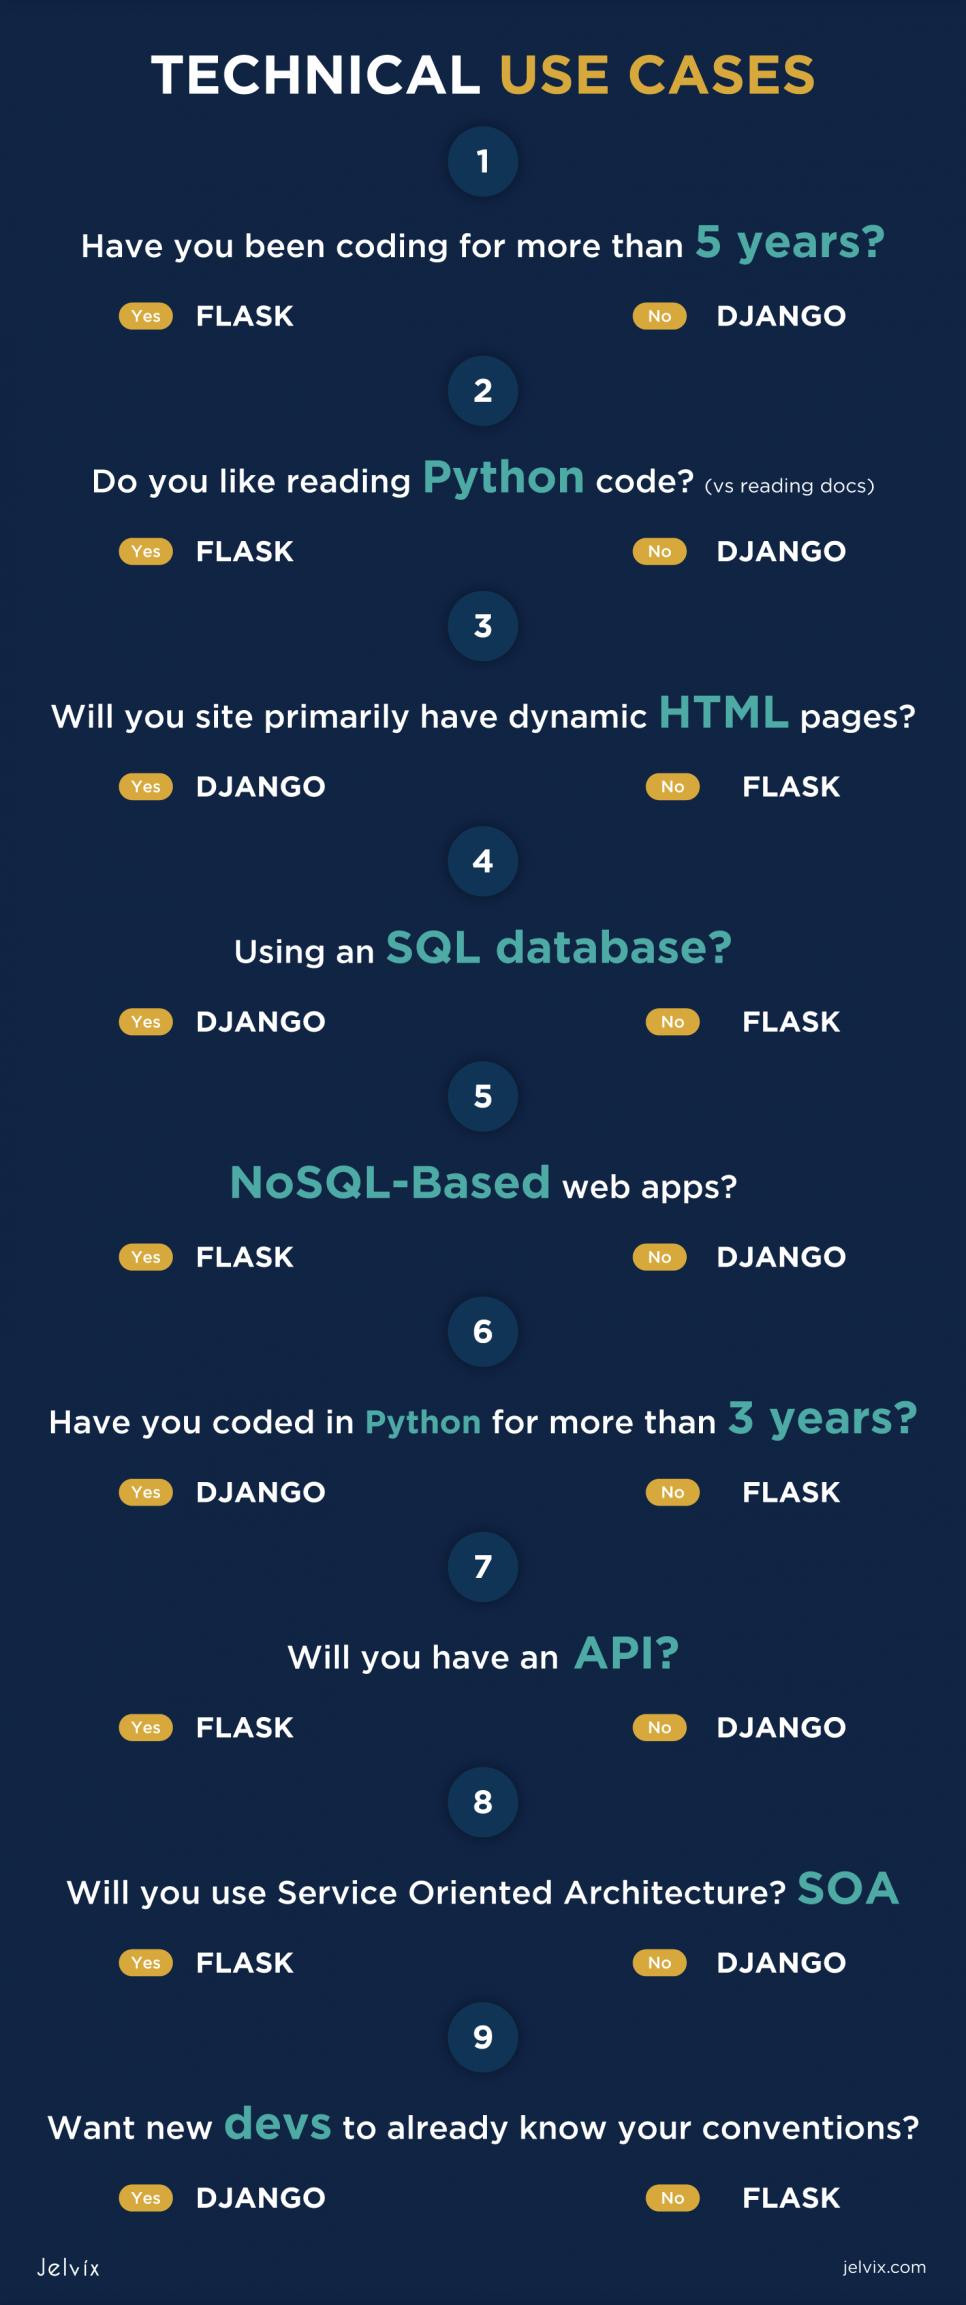 django-vs-flask use cases